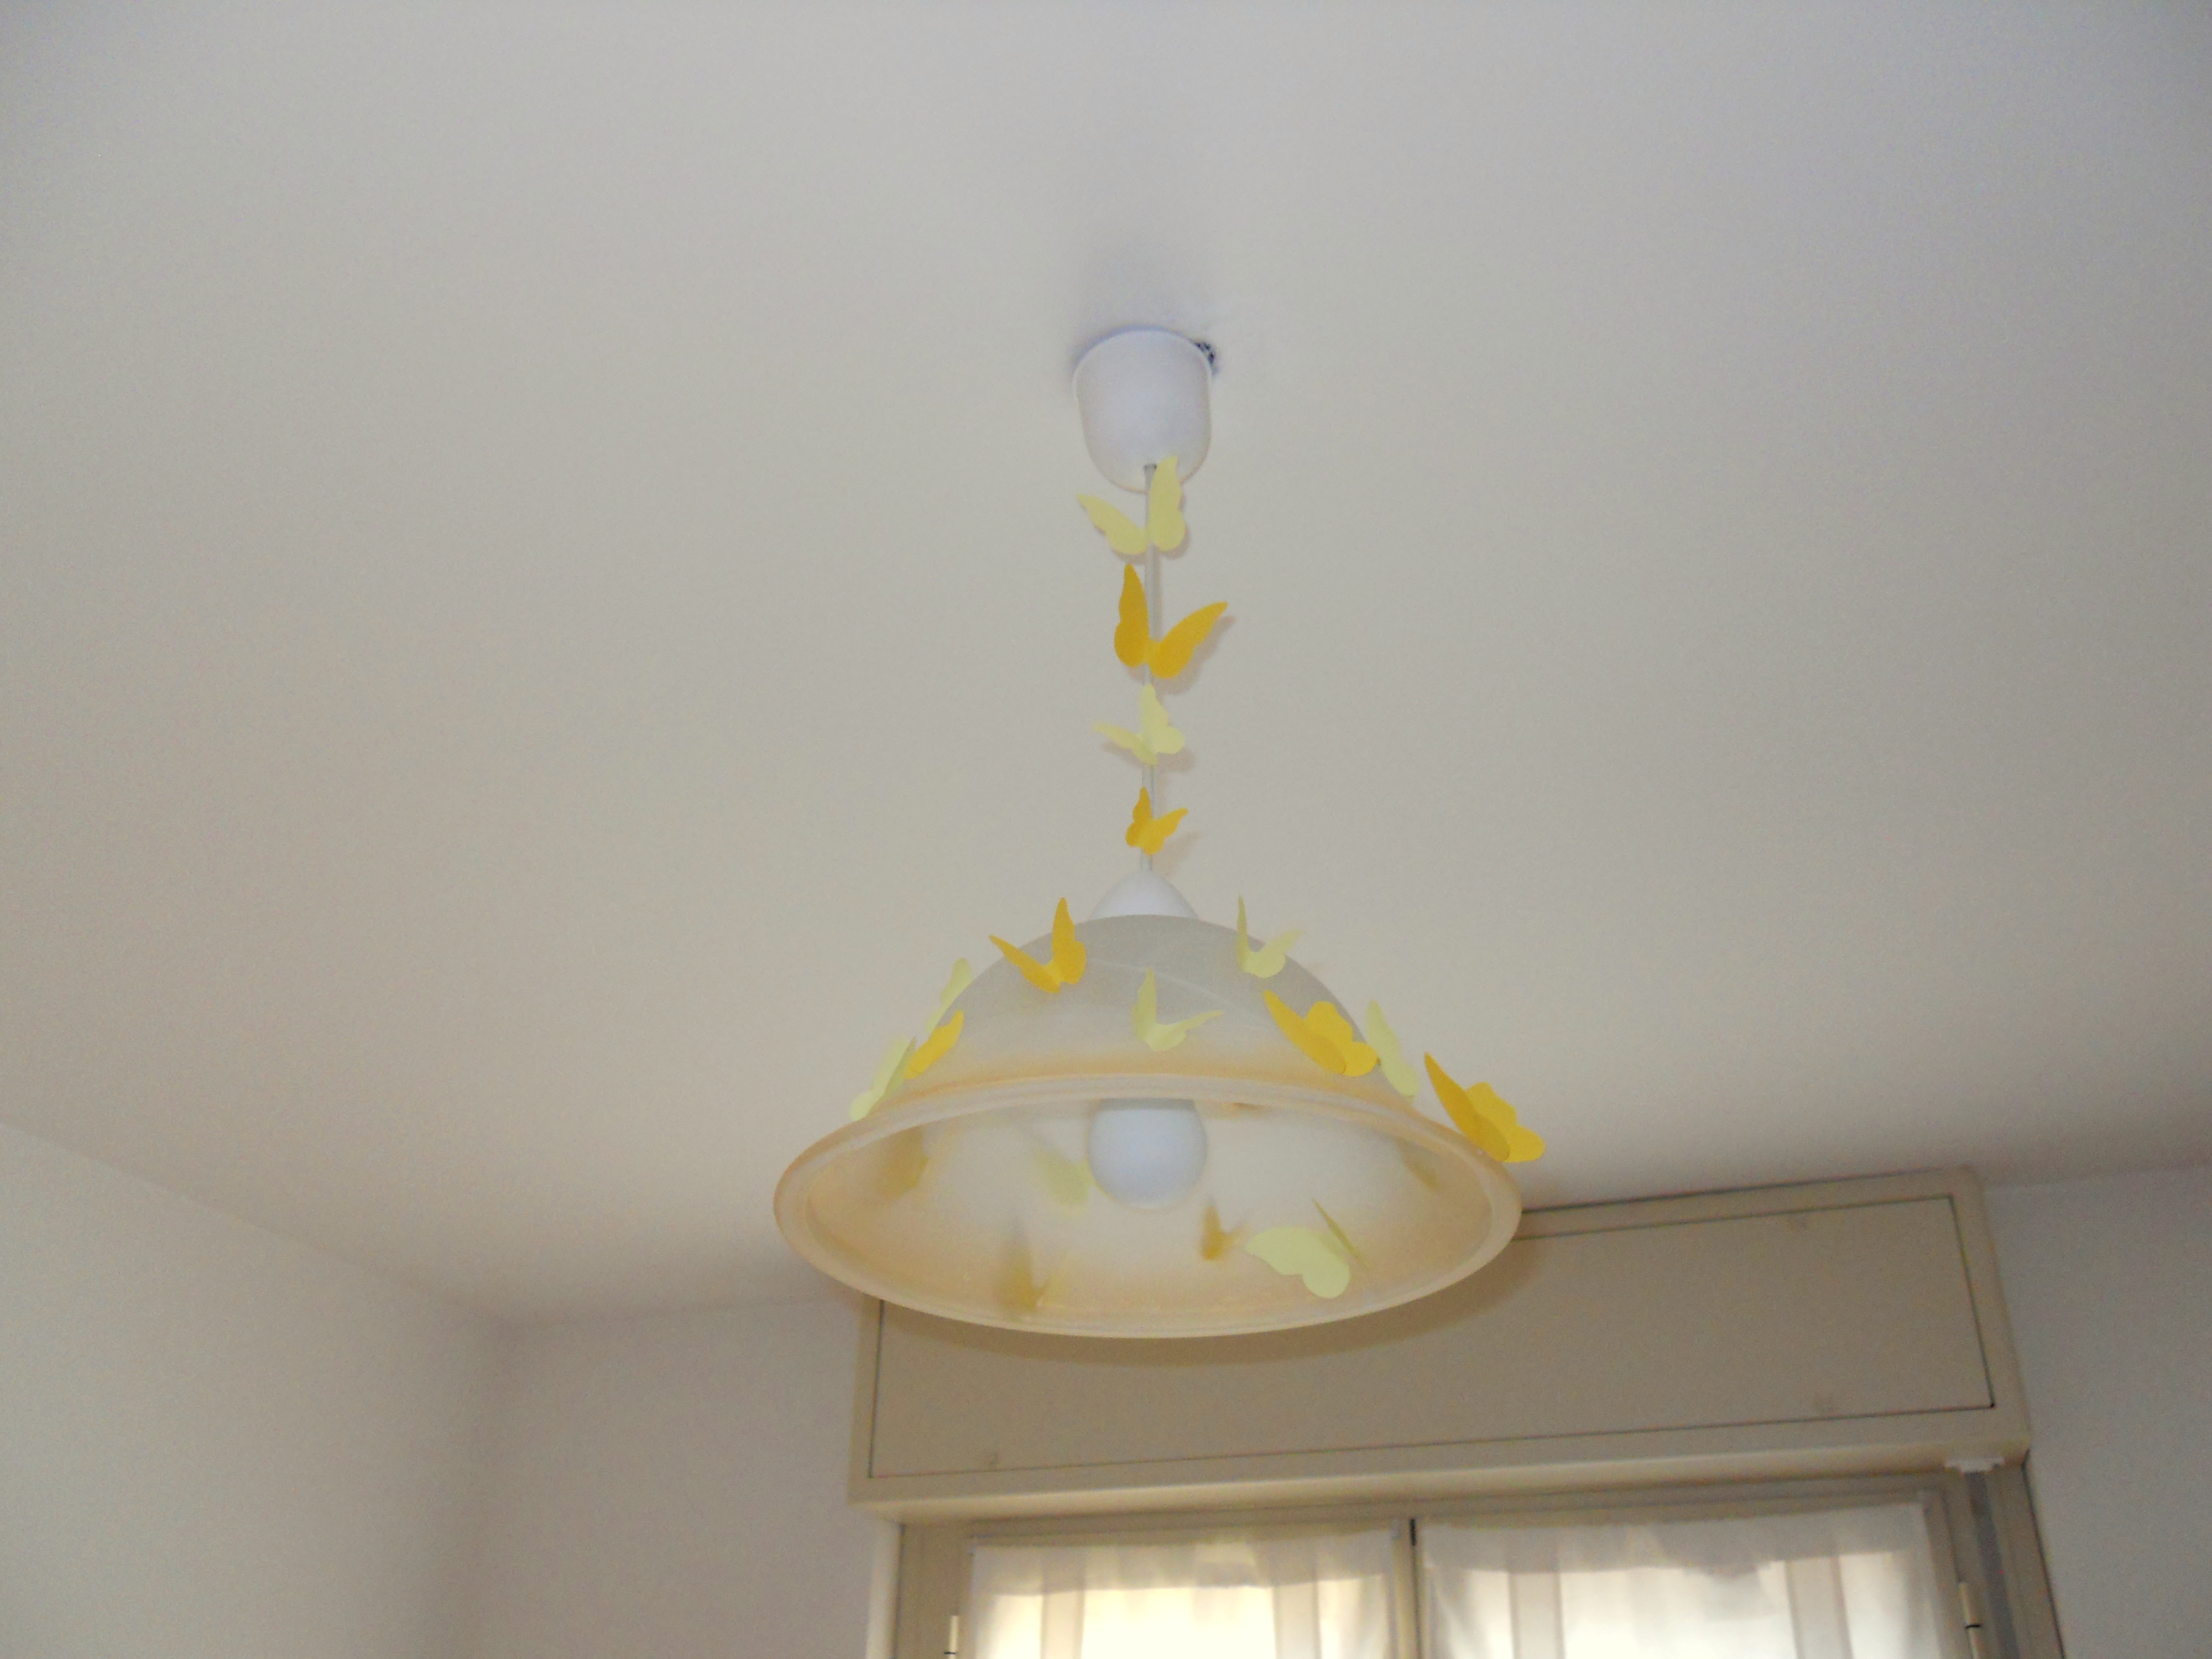 Farfalle Fai Da Te riciclo creativo in cameretta: lampadario farfalle fai da te